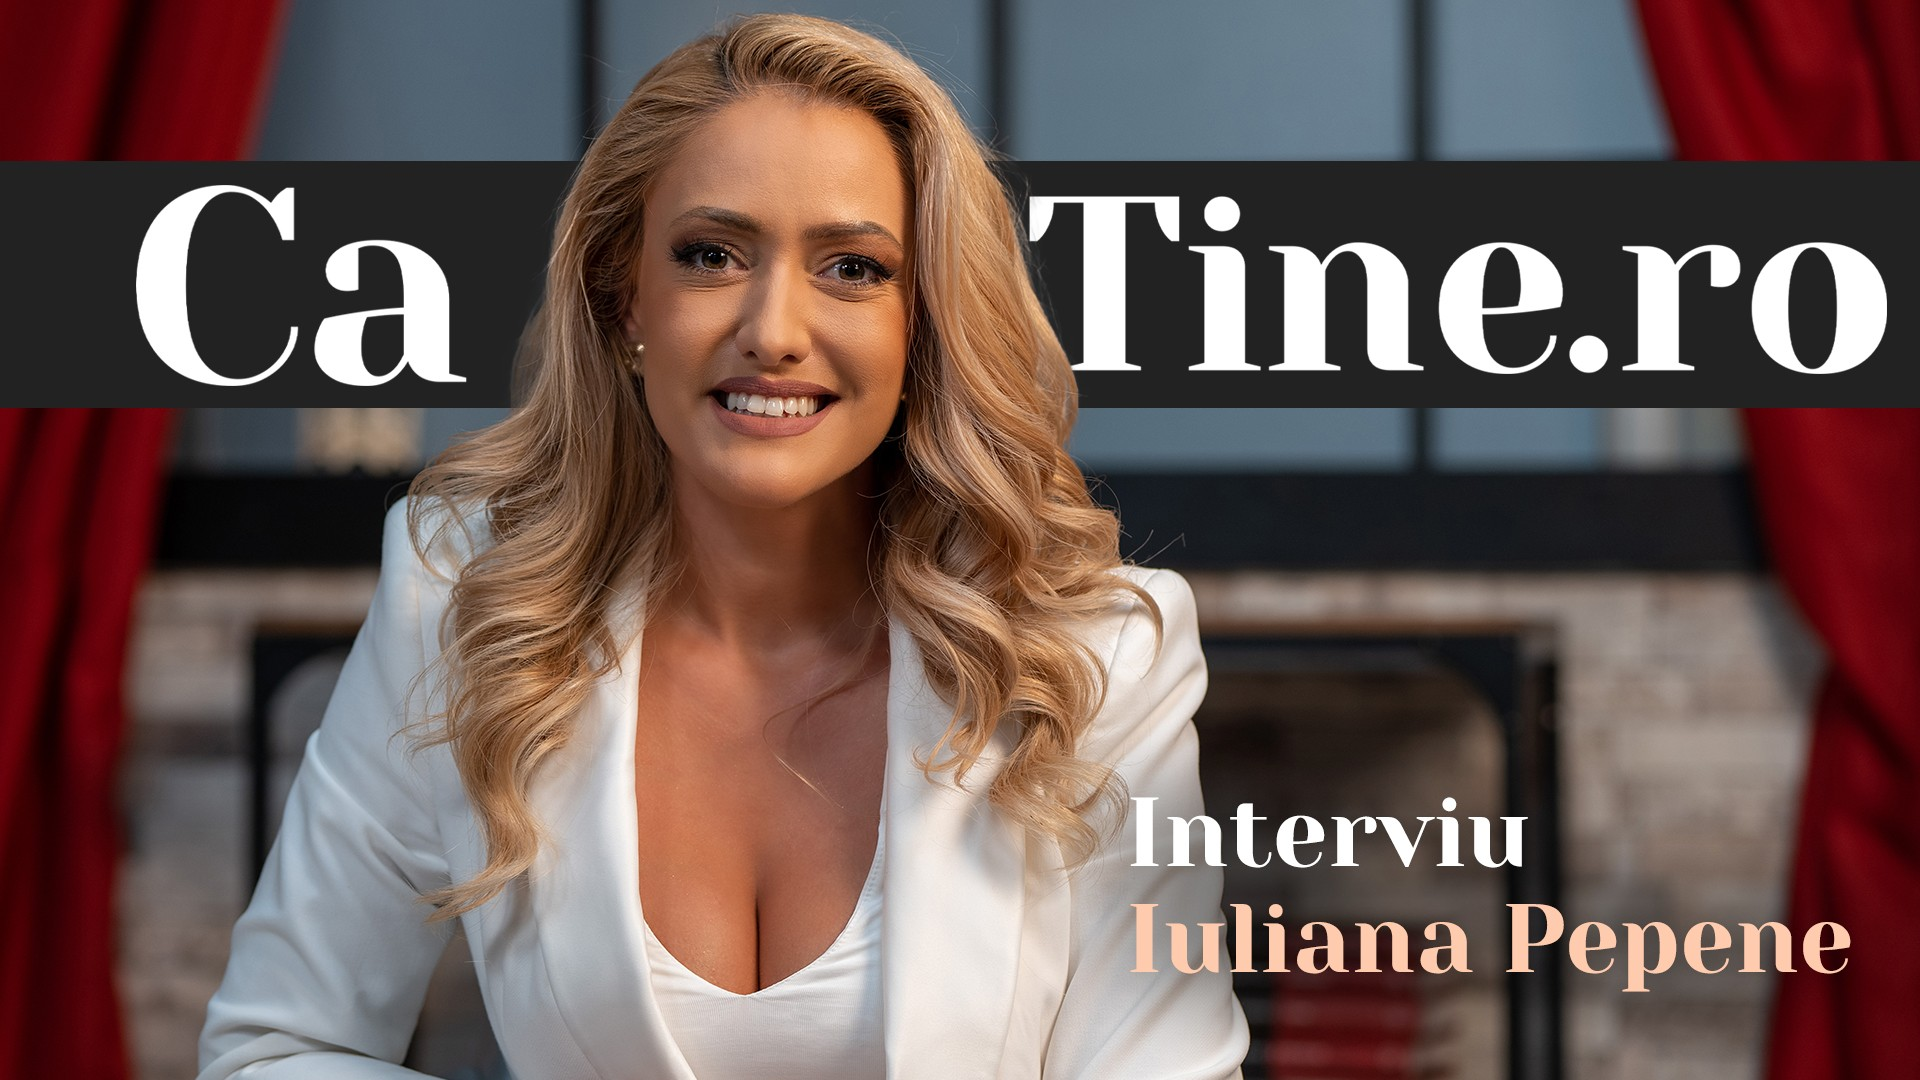 CaTine.ro - Interviu - Iuliana Pepene - Feminină